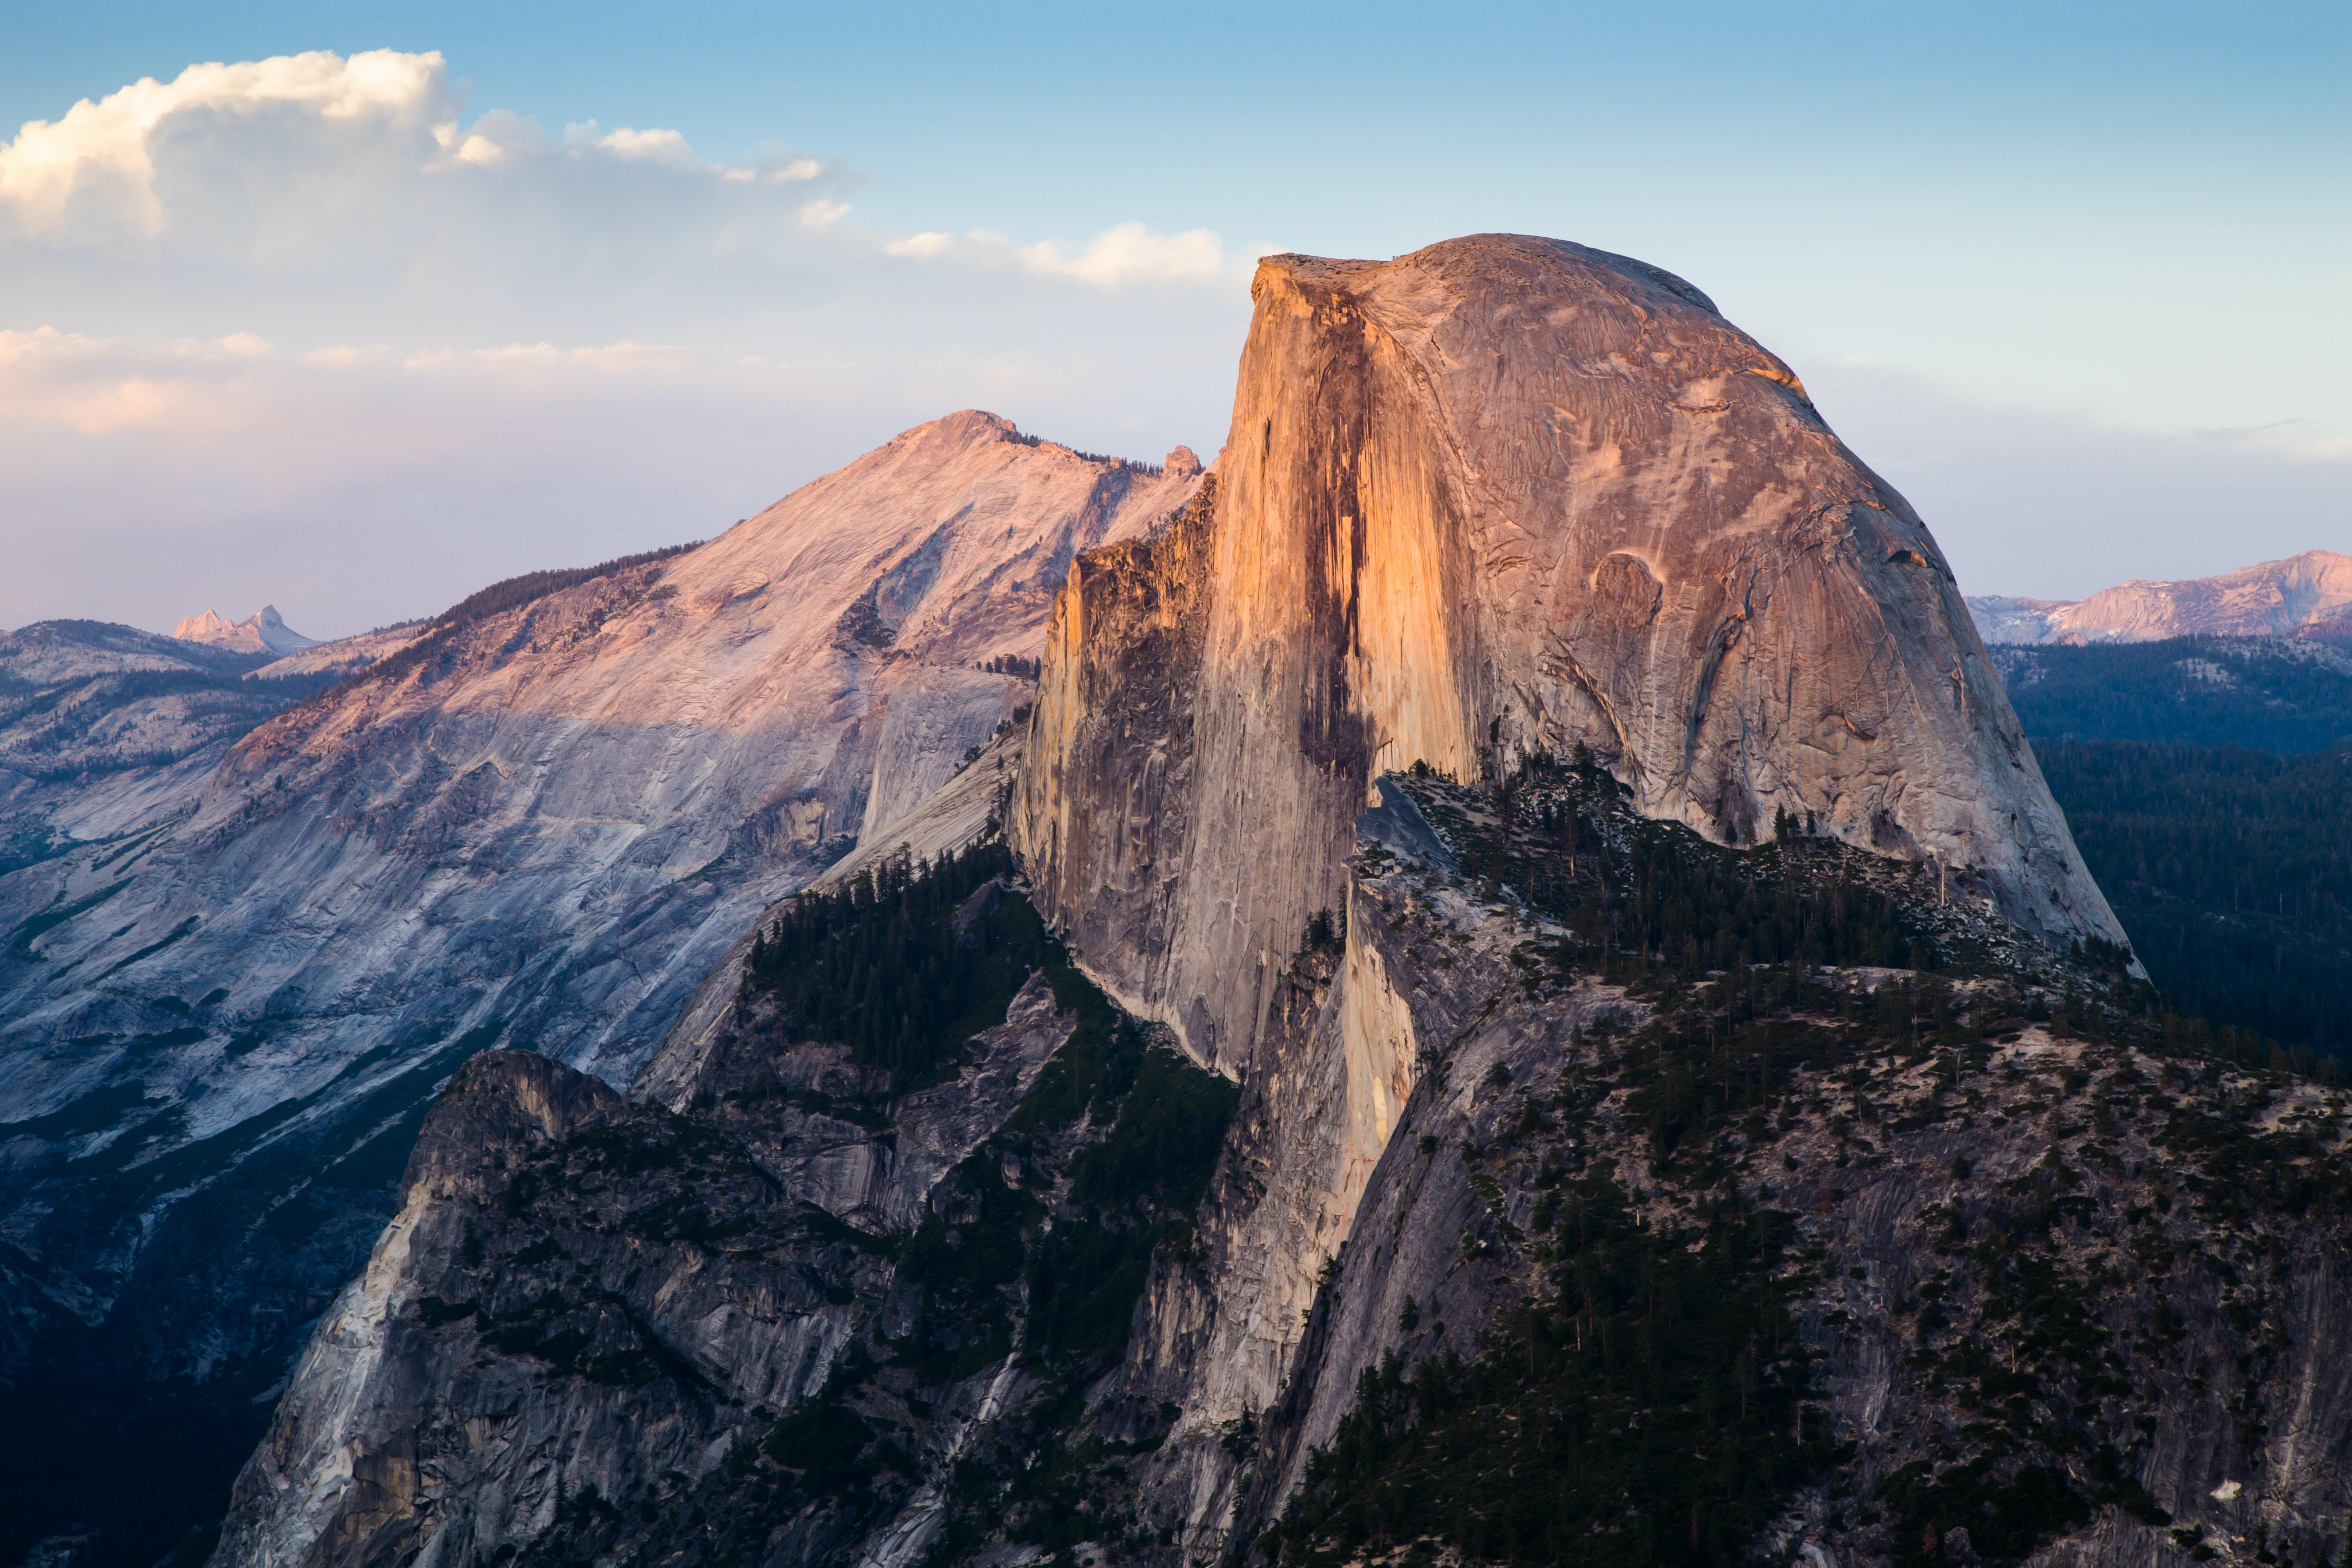 A steep mountain peek at the edge of a sharp mountain ridge